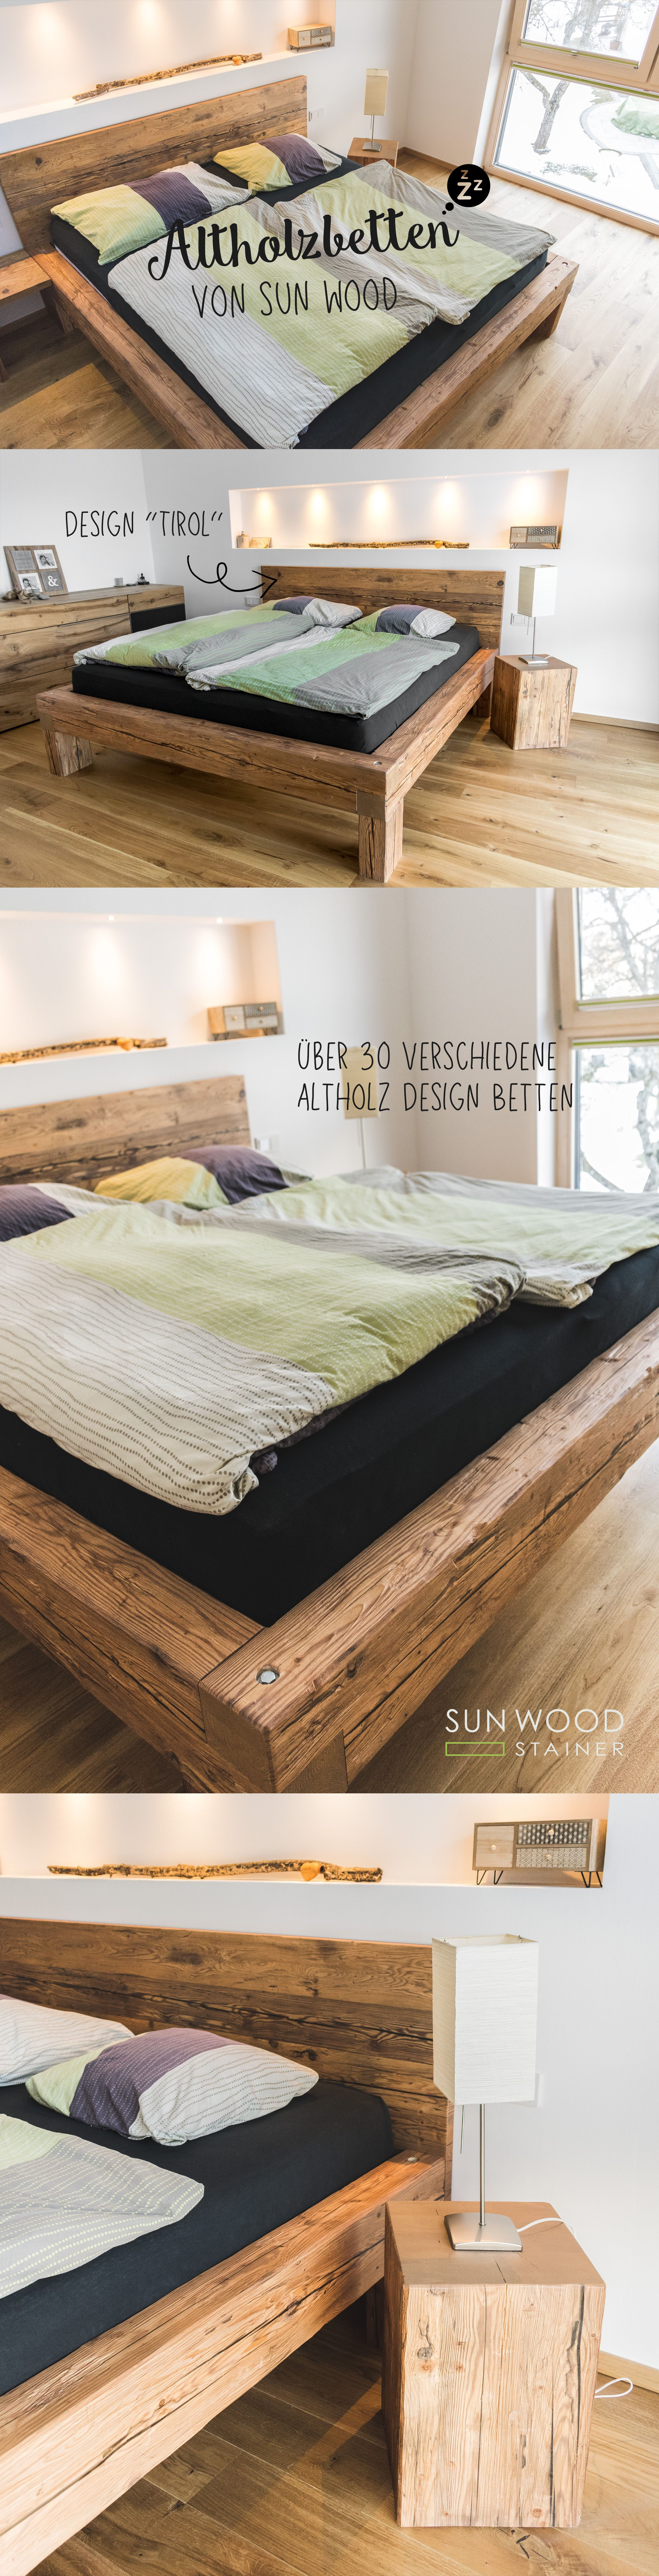 Massives holzbett altholzdesign tirol möbel ideen pinterest